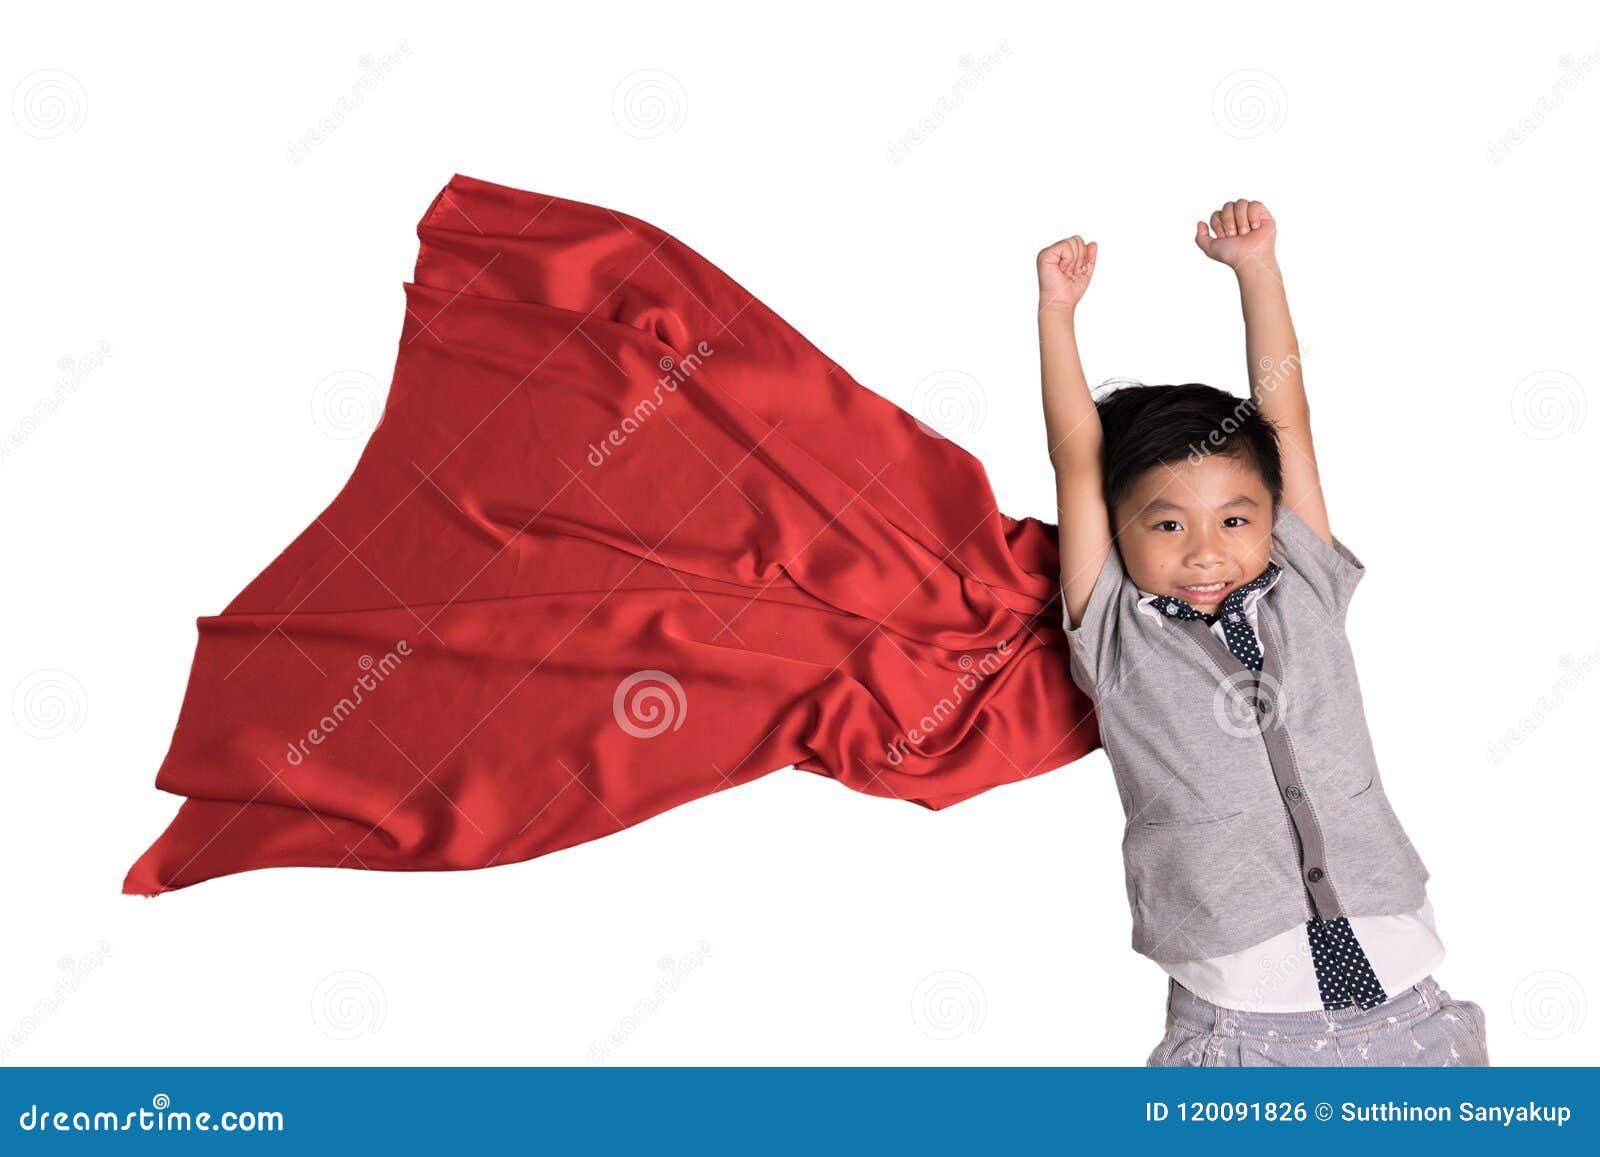 Flying superhero in studio, Child pretend to be superhero, Super